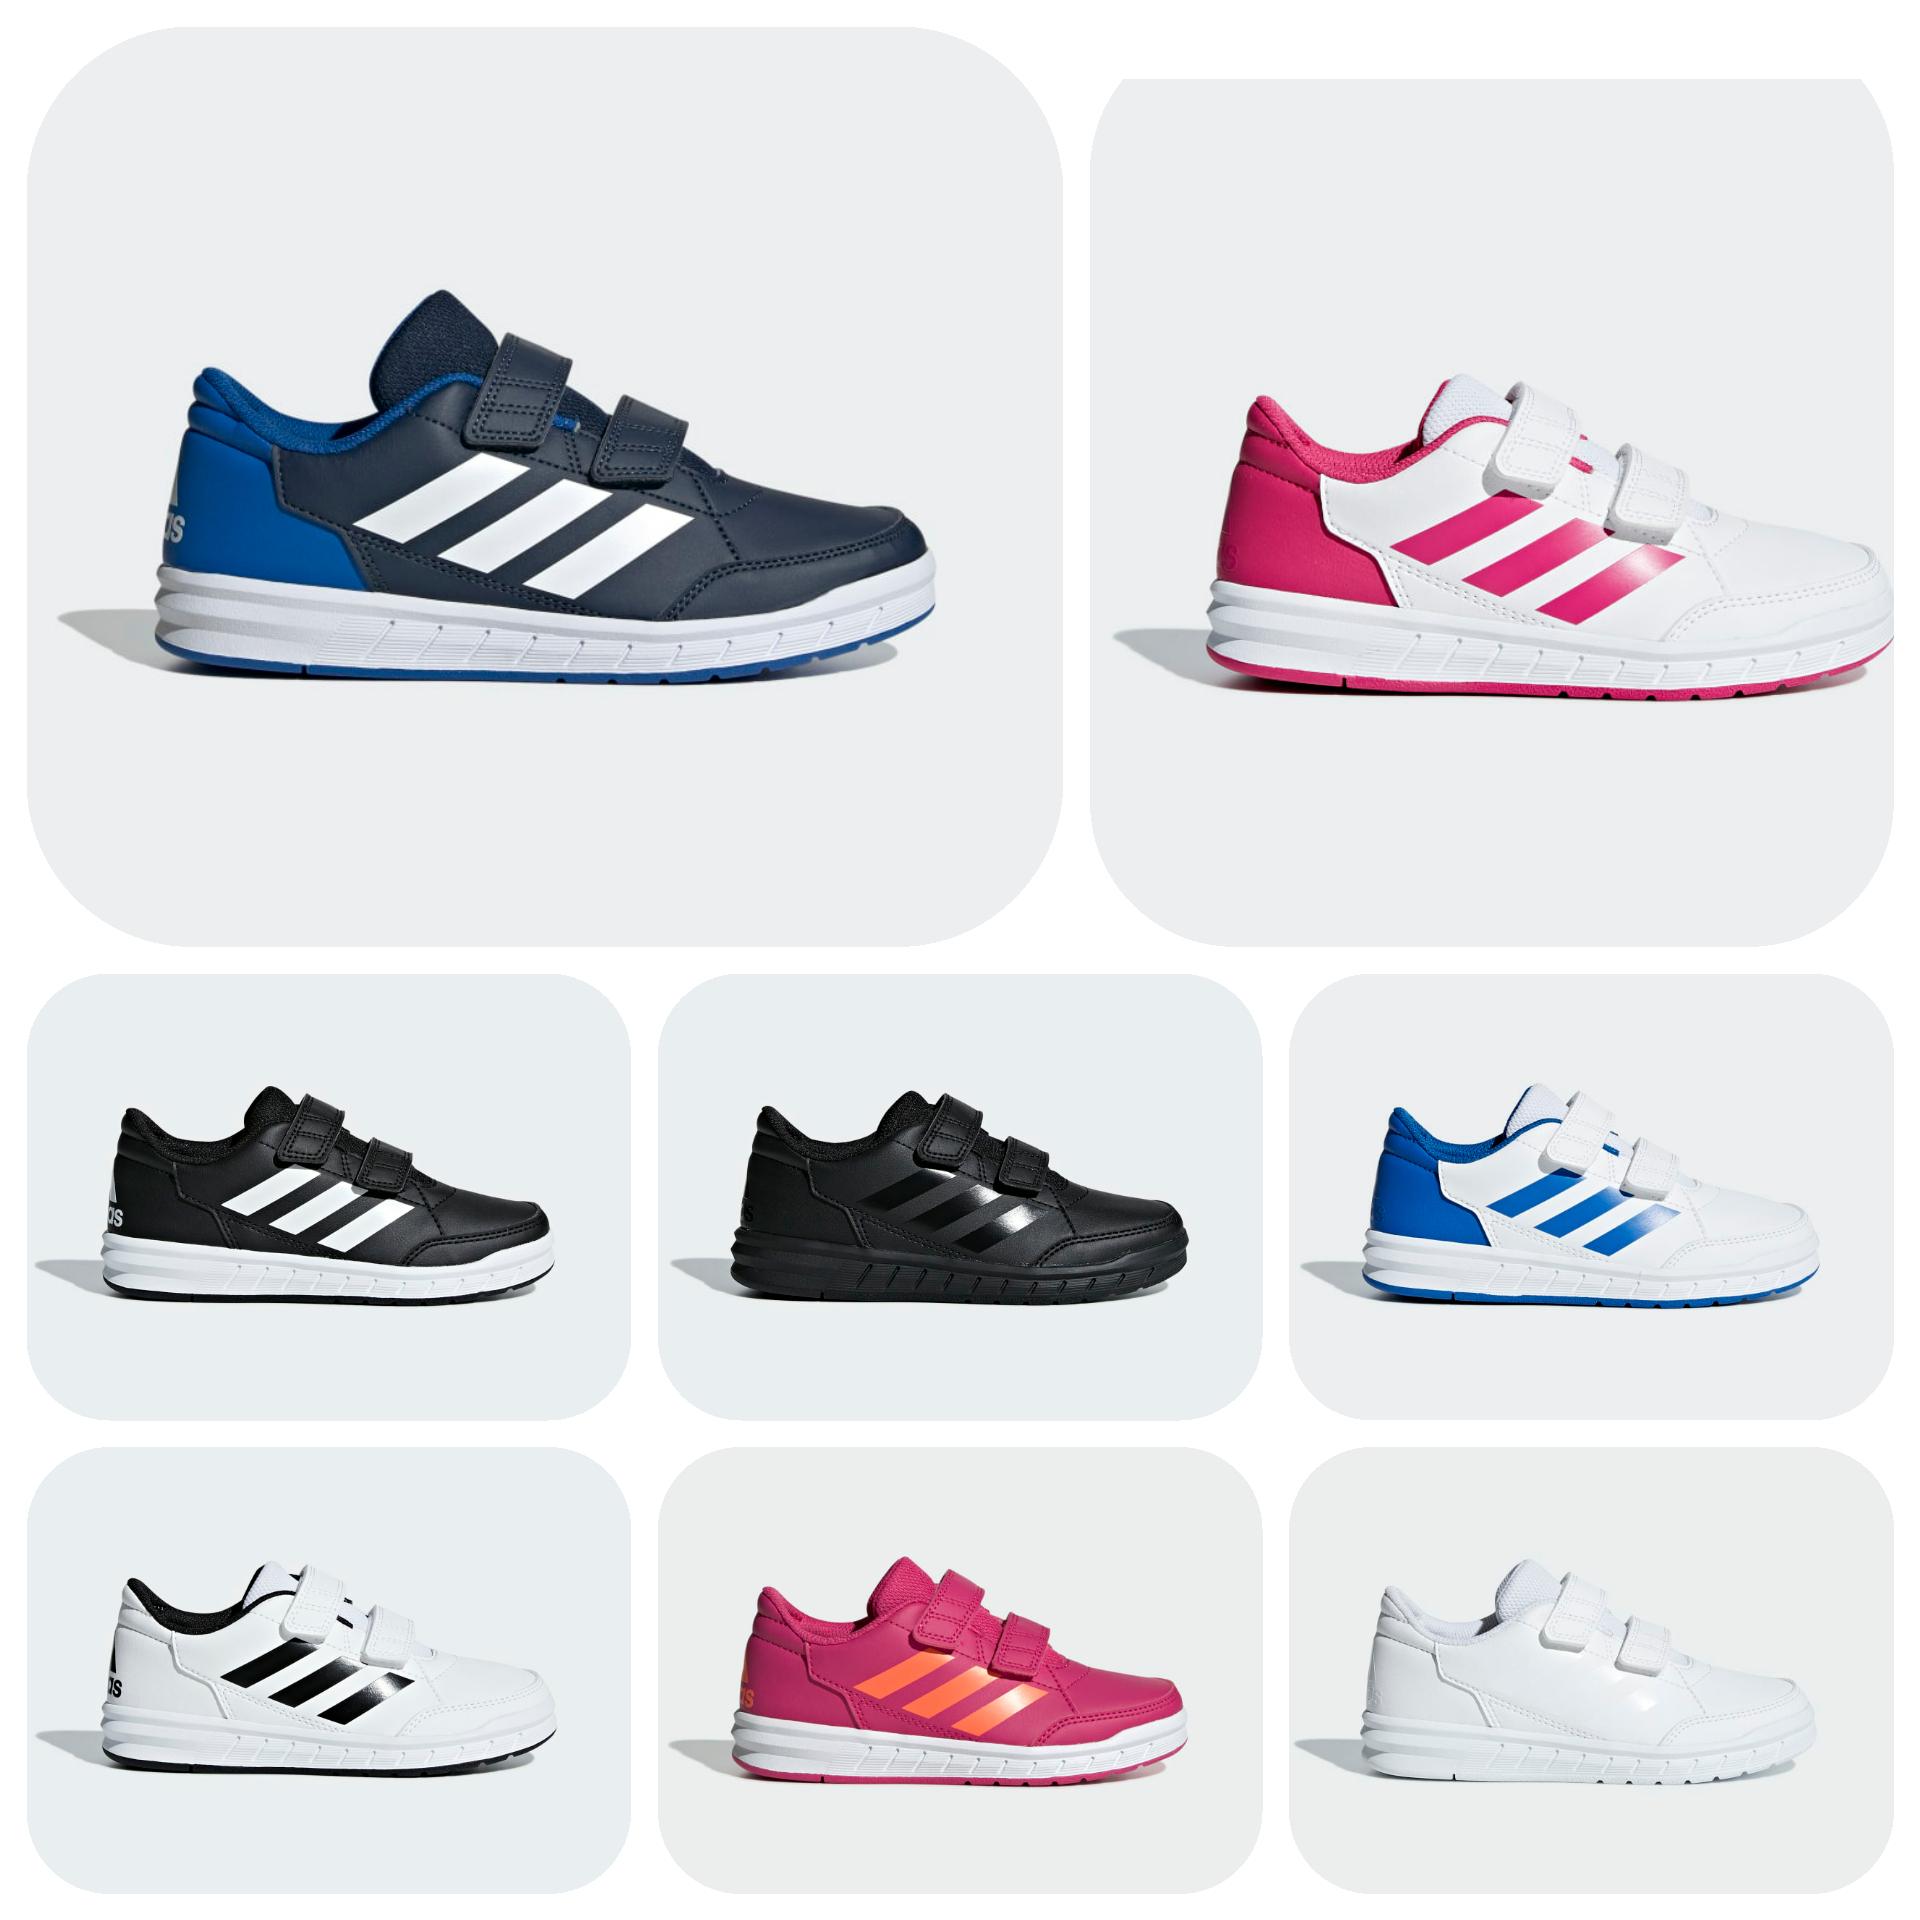 Adidas Scarpa Ragazzi Altasport